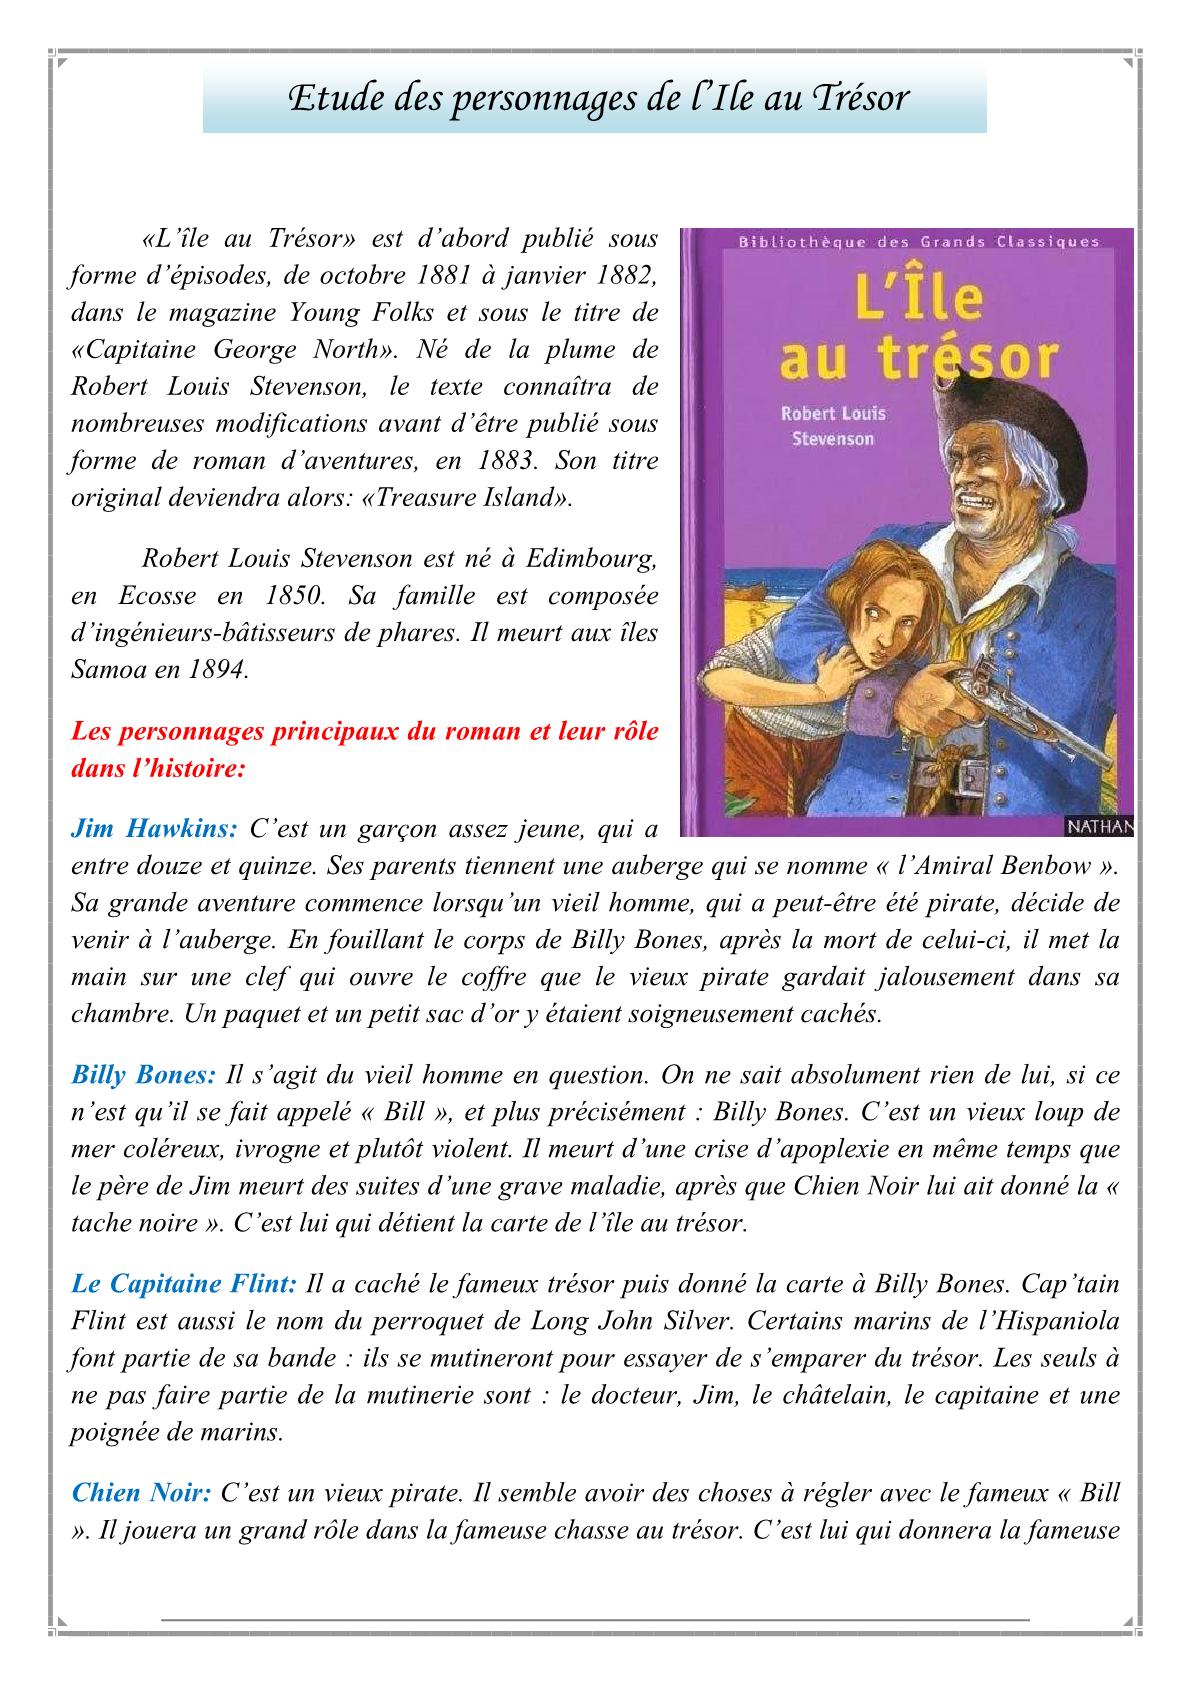 درس Etude des personnages de L'Île au trésor بمادة اللغة الفرنسية